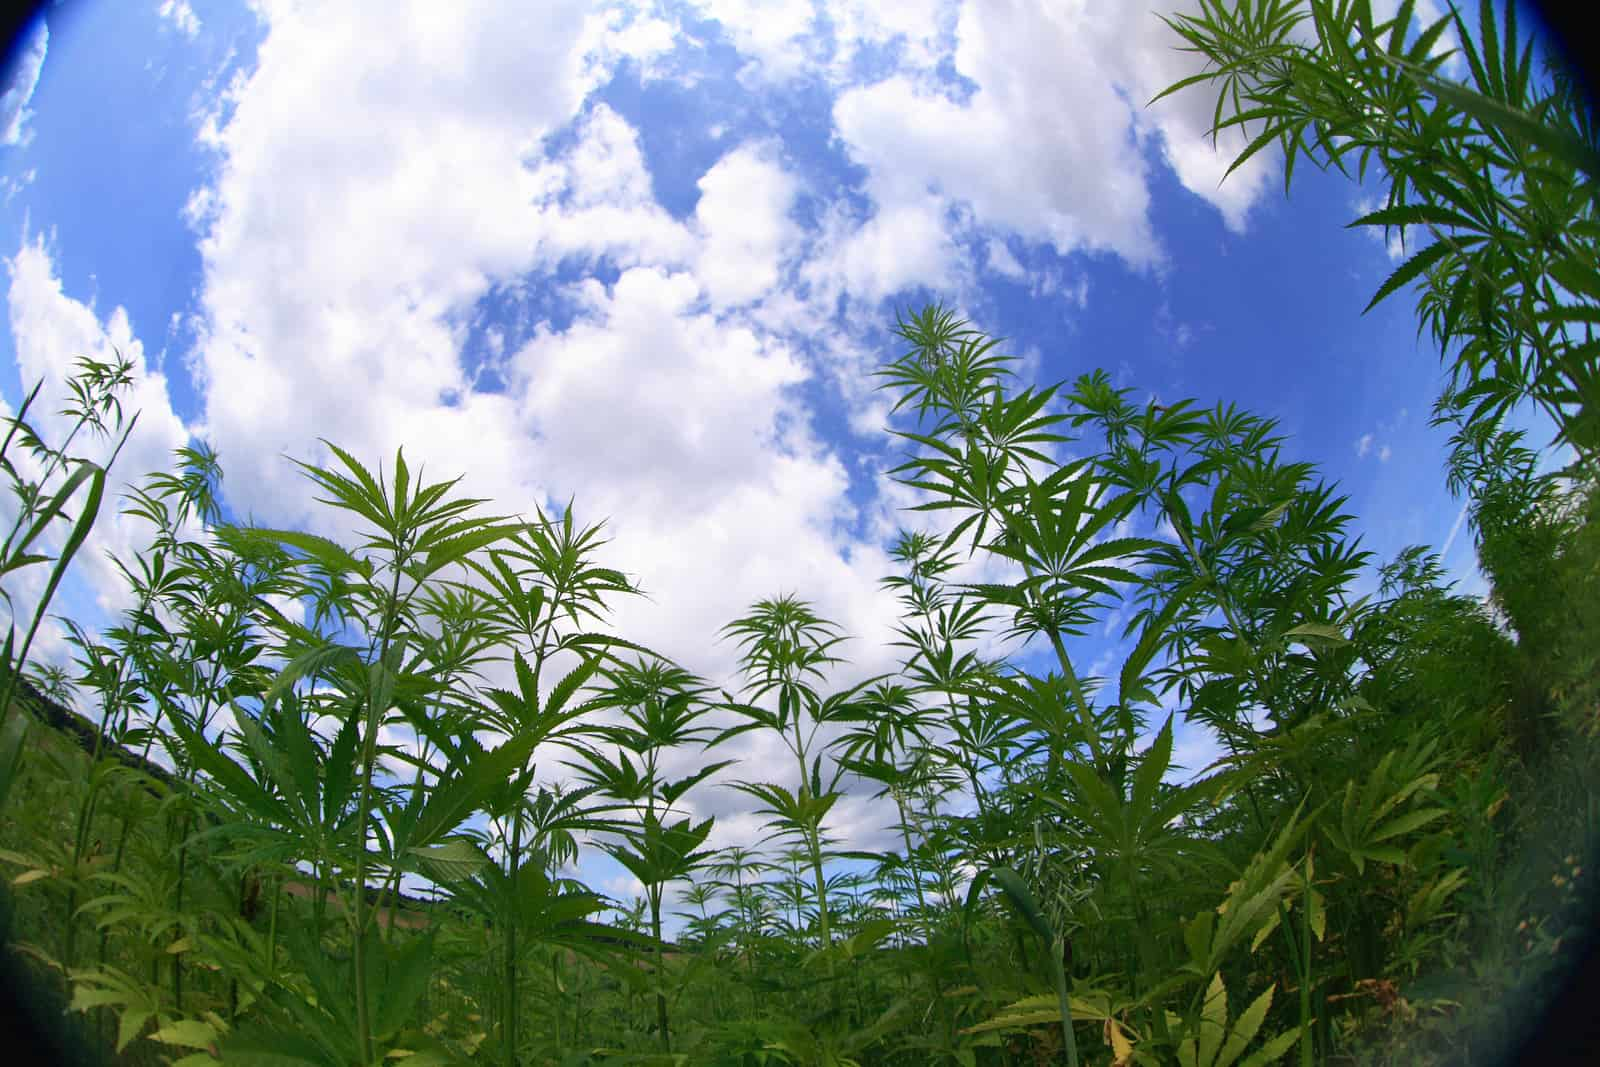 U.N Removes Marijuana From List of Most Dangerous Drugs. Field of marijuana plants.